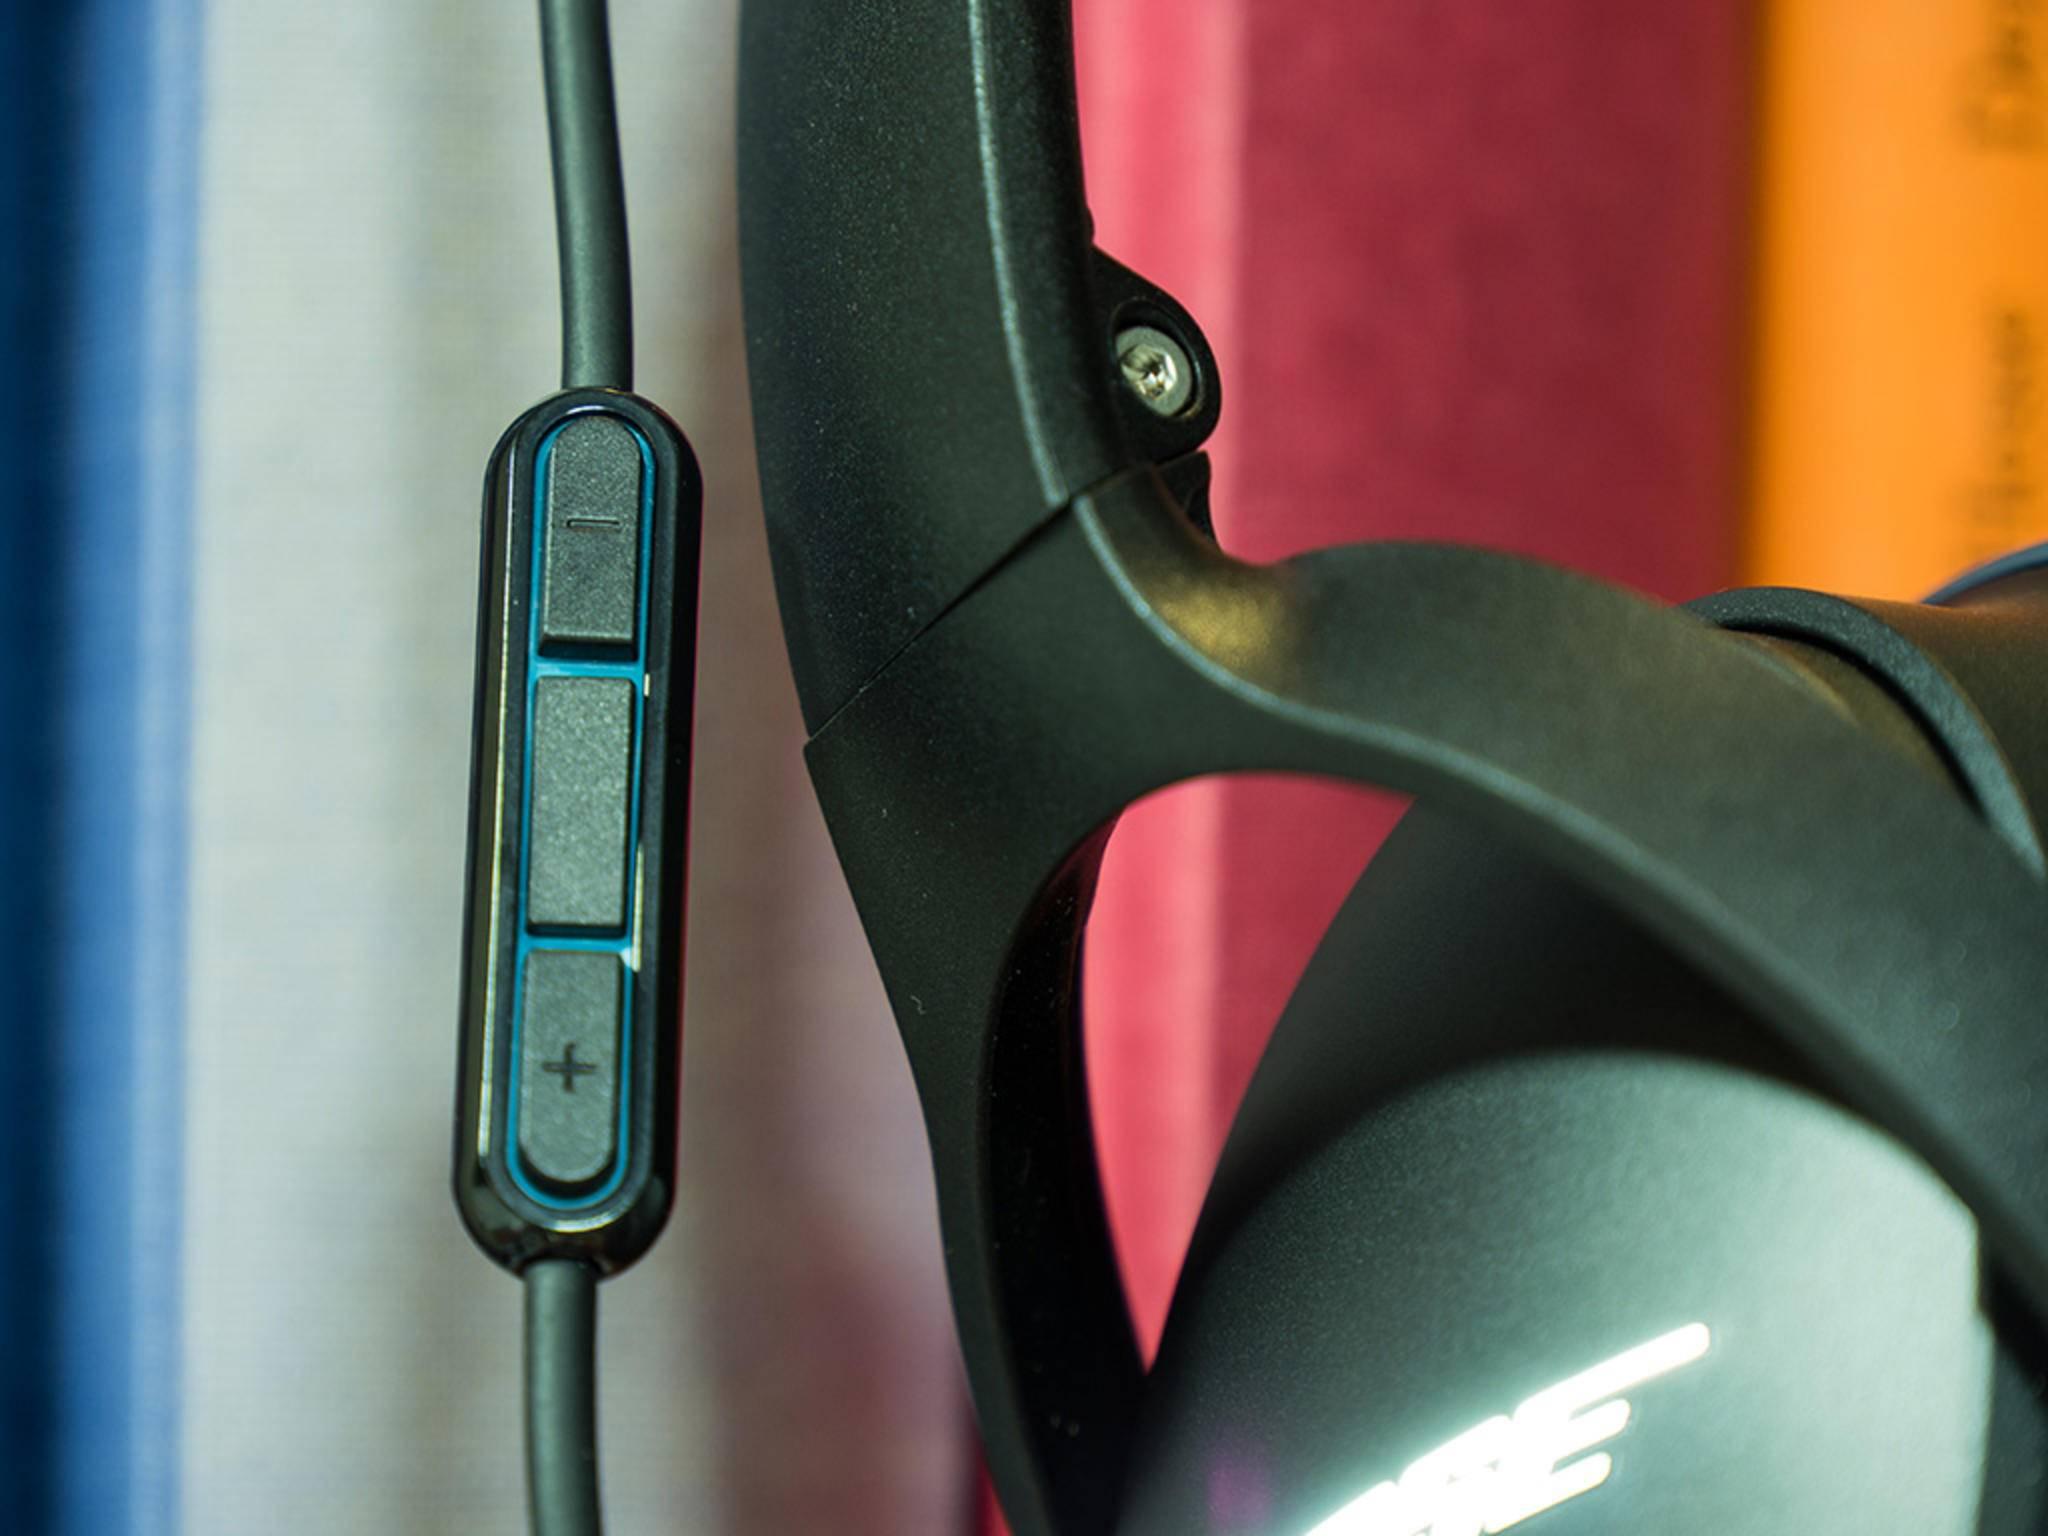 Das Anschlusskabel ein Mikrofon nebst Lautstärkewippe.